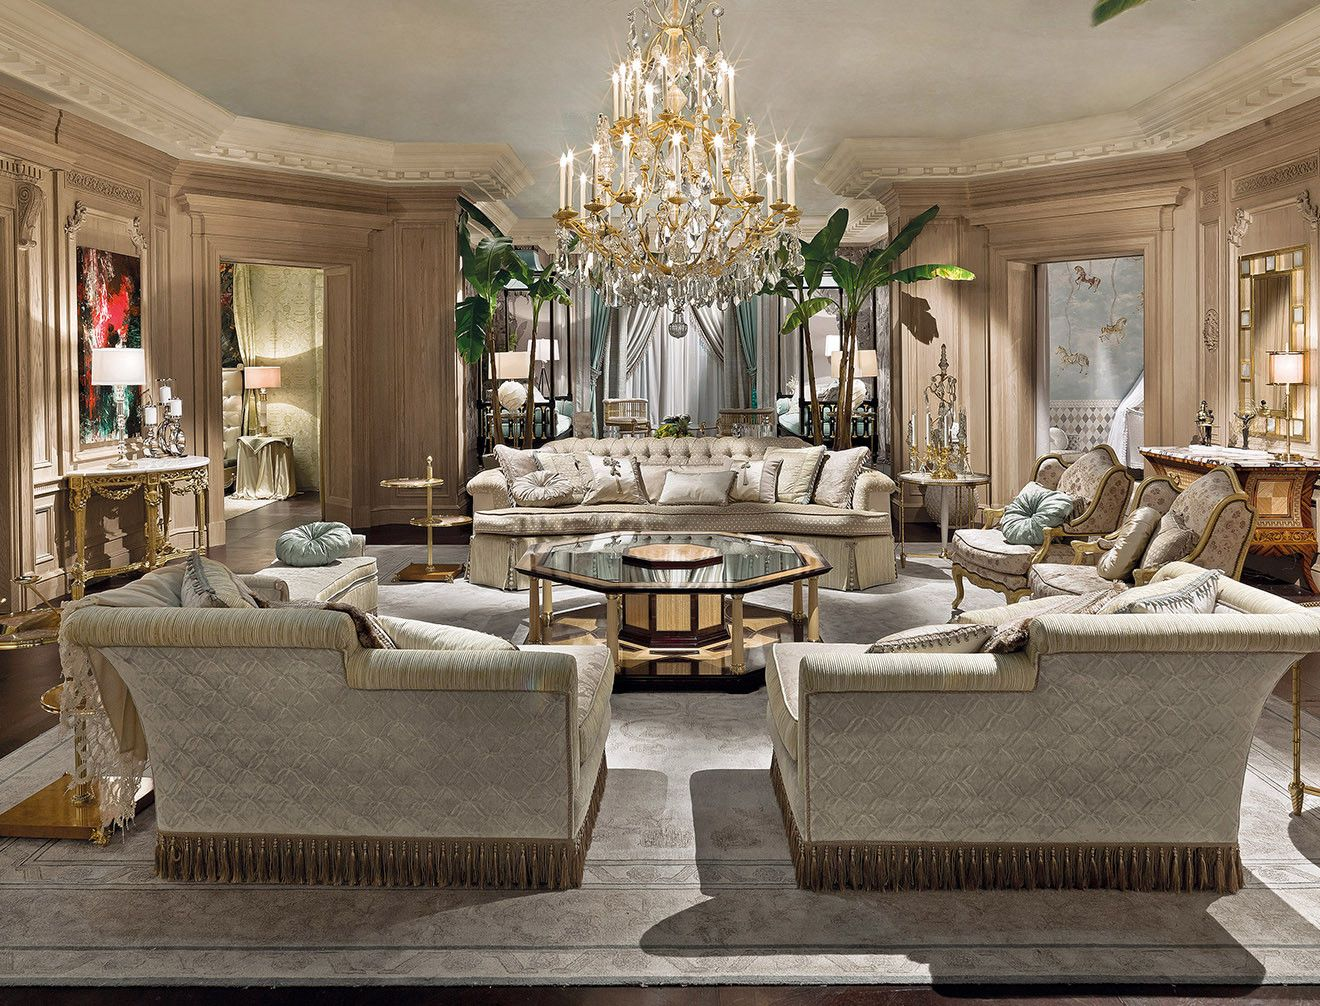 Provasi Luxury Italian furniture design, exhibiting at Salone Milan – Martyn White London ...